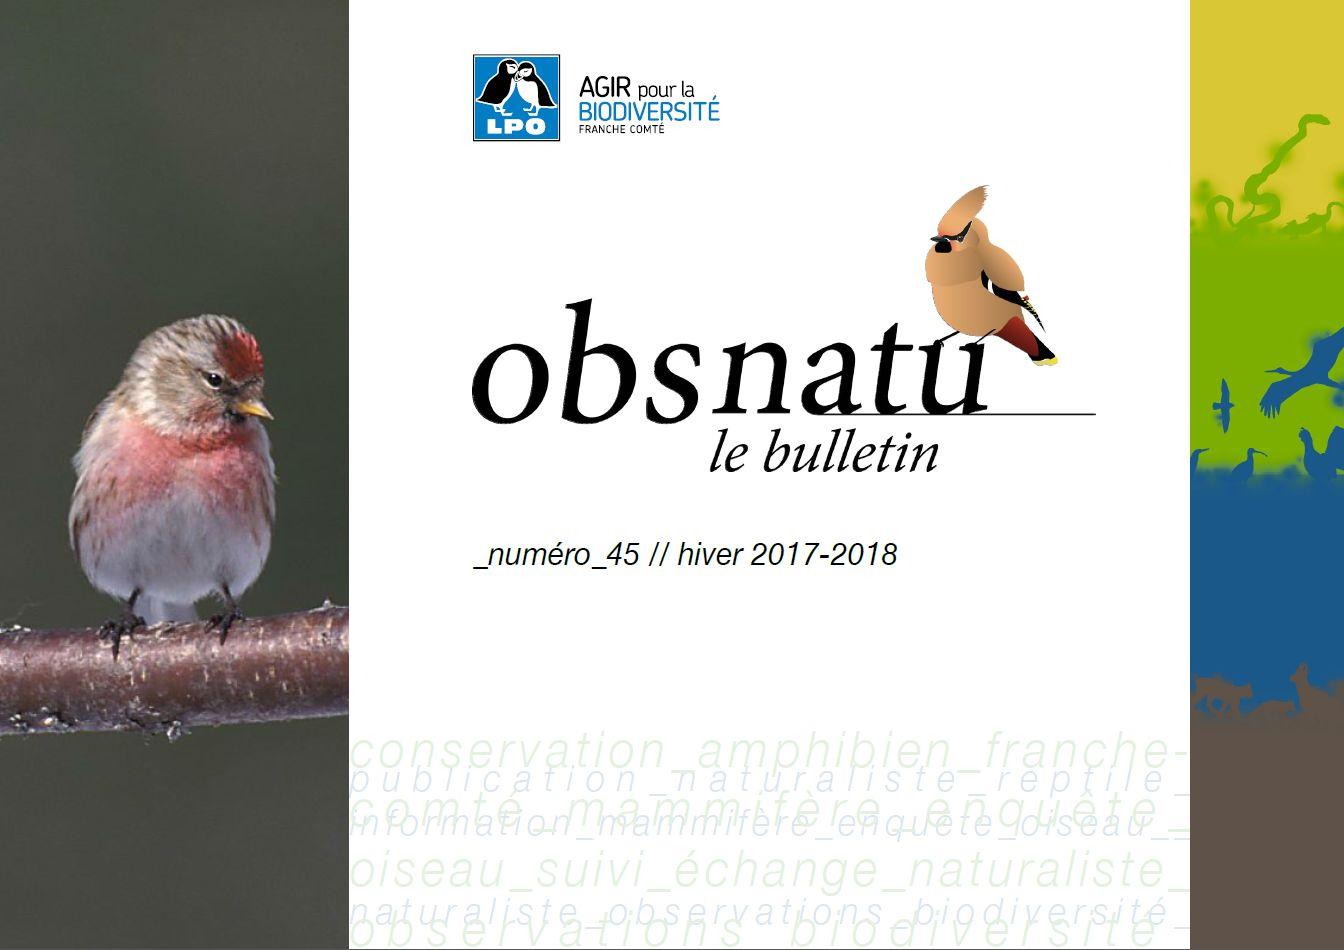 https://cdnfiles1.biolovision.net/franche-comte.lpo.fr/userfiles/publications/Obsnatubulls/Obsnatun45hiver2017-2018couv.jpg